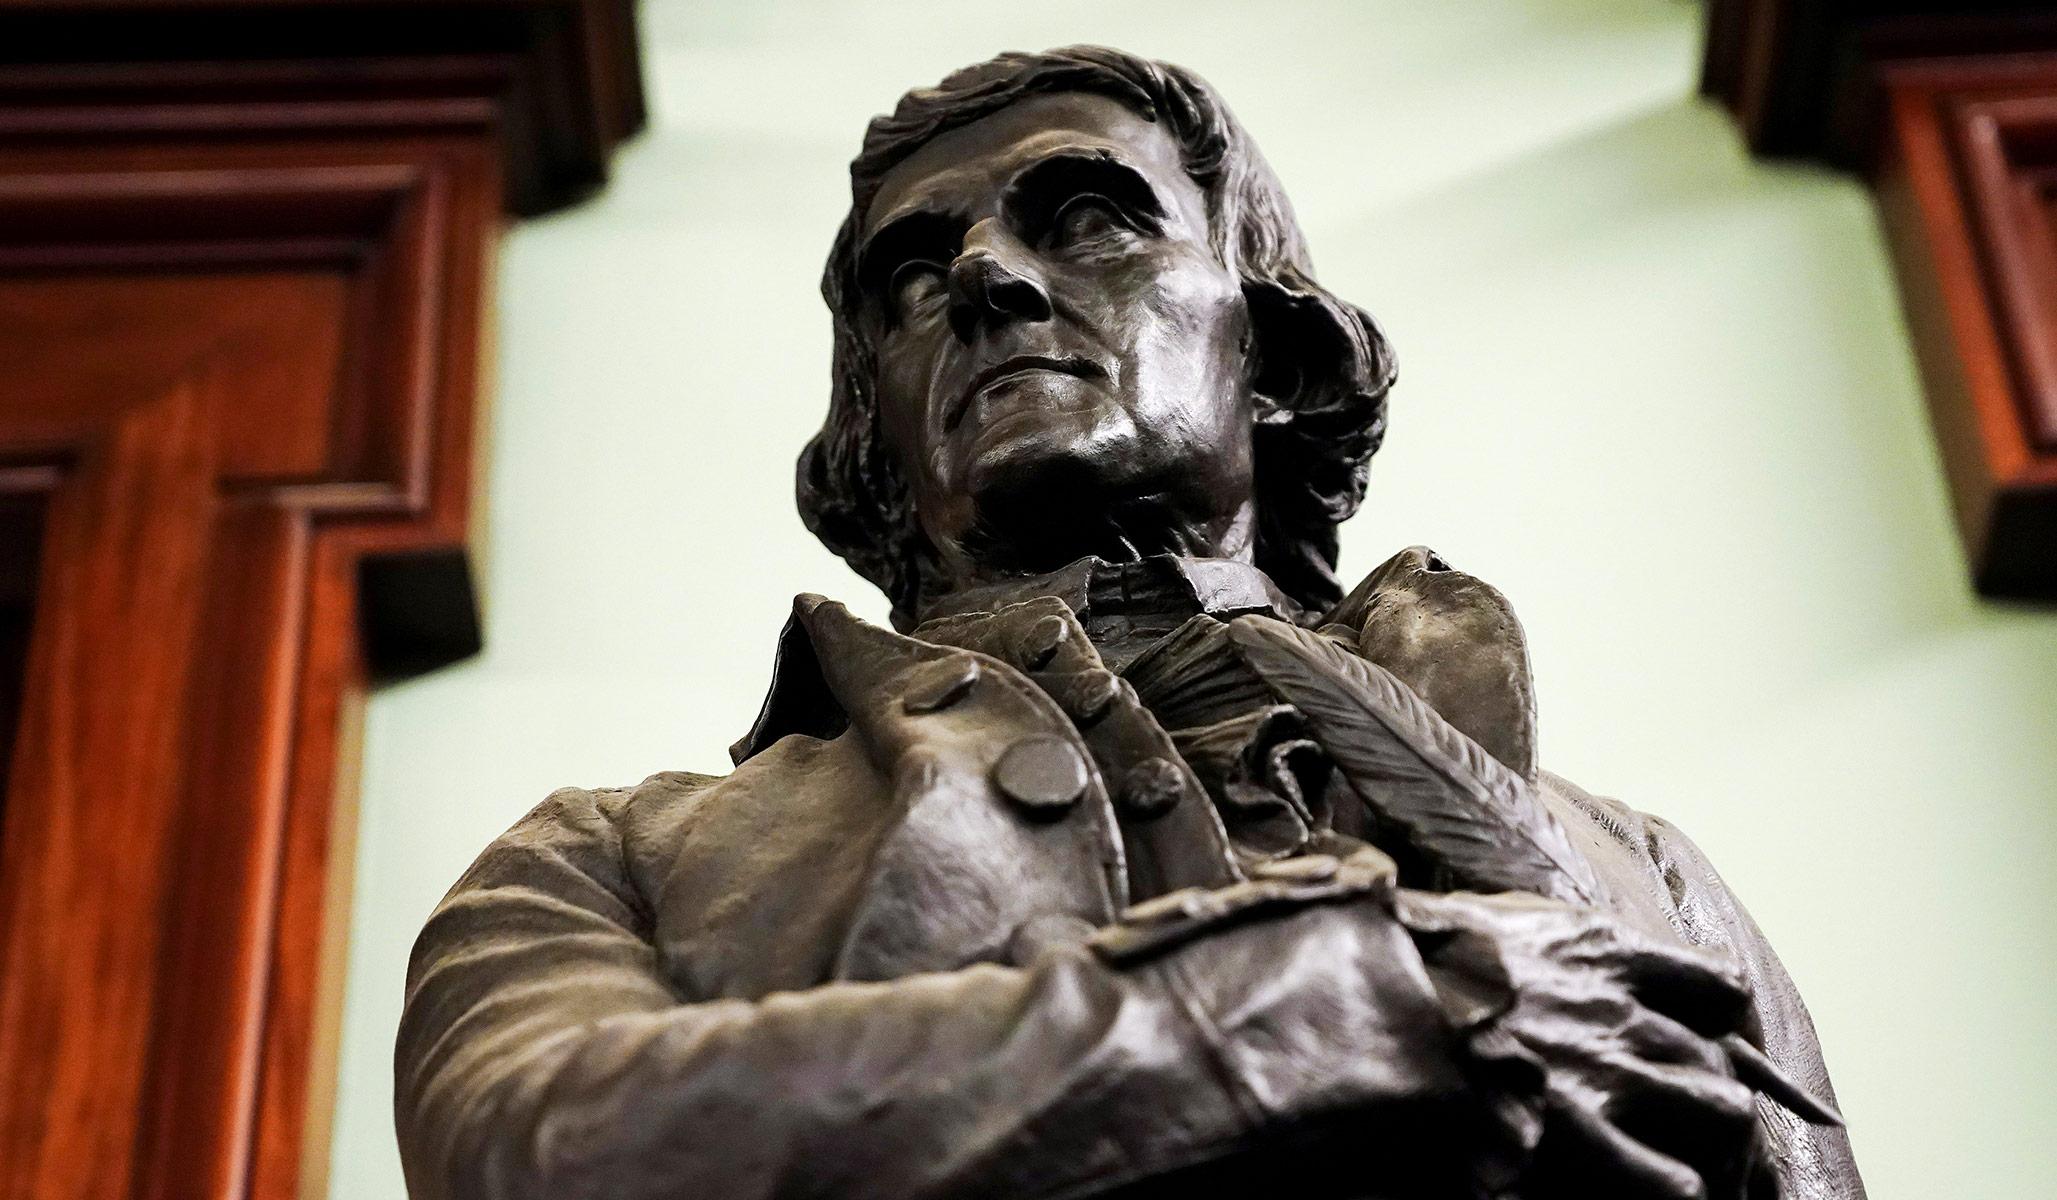 Canceling Thomas Jefferson